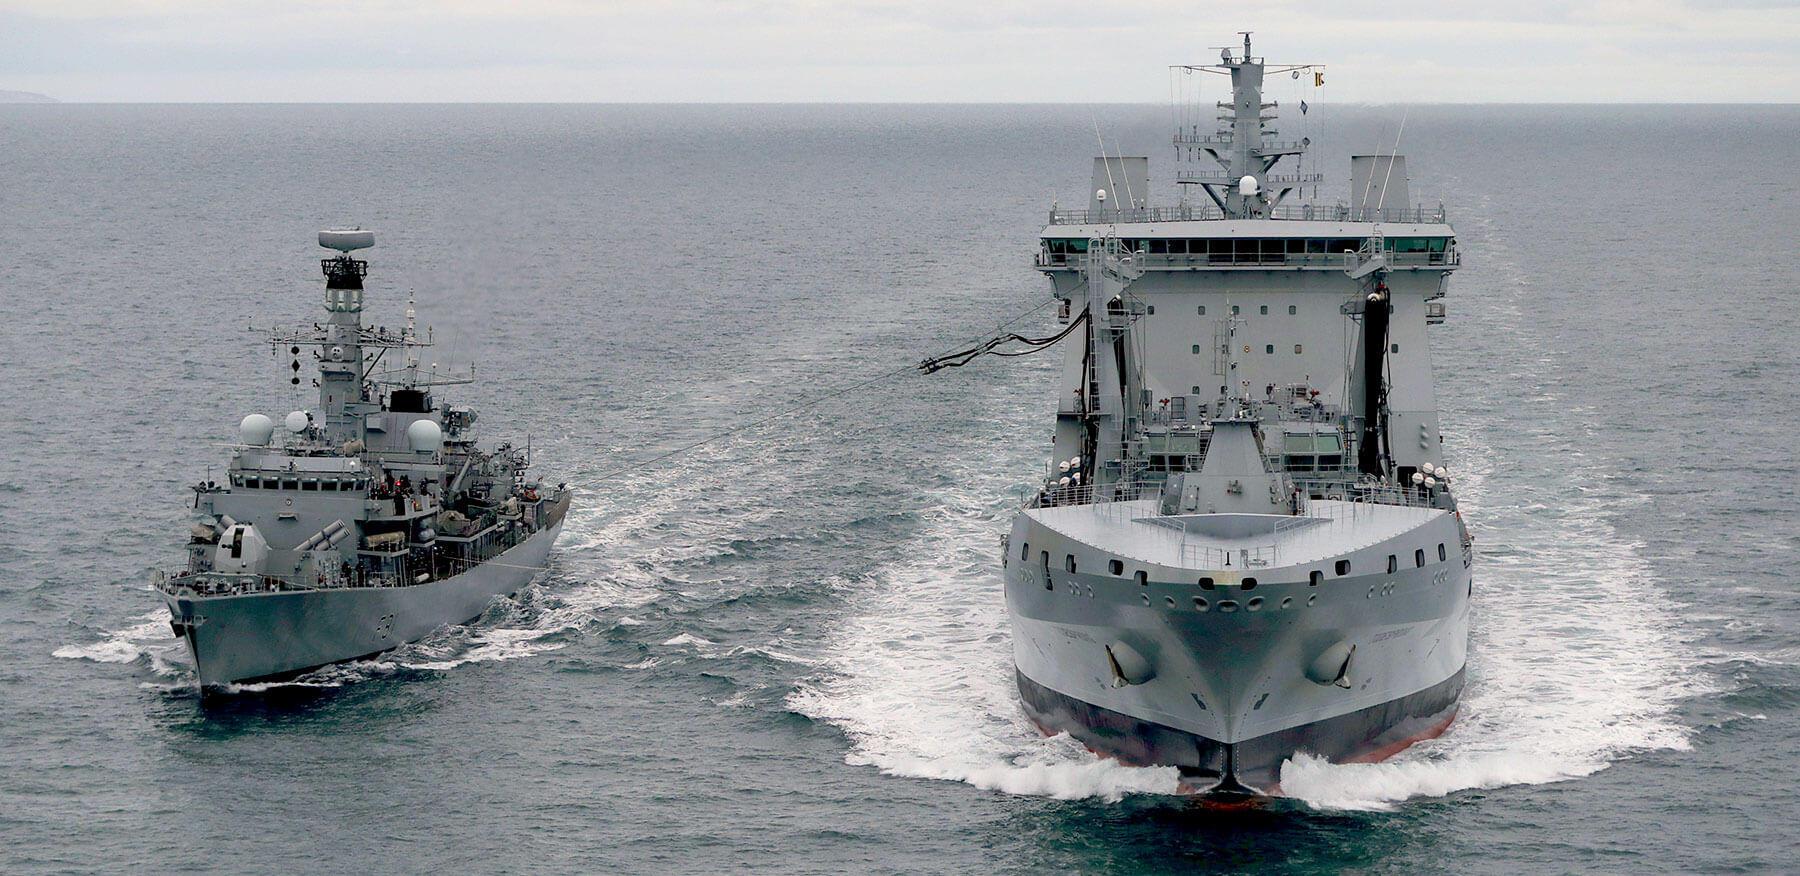 RFA Tidespring HMS Sutherland